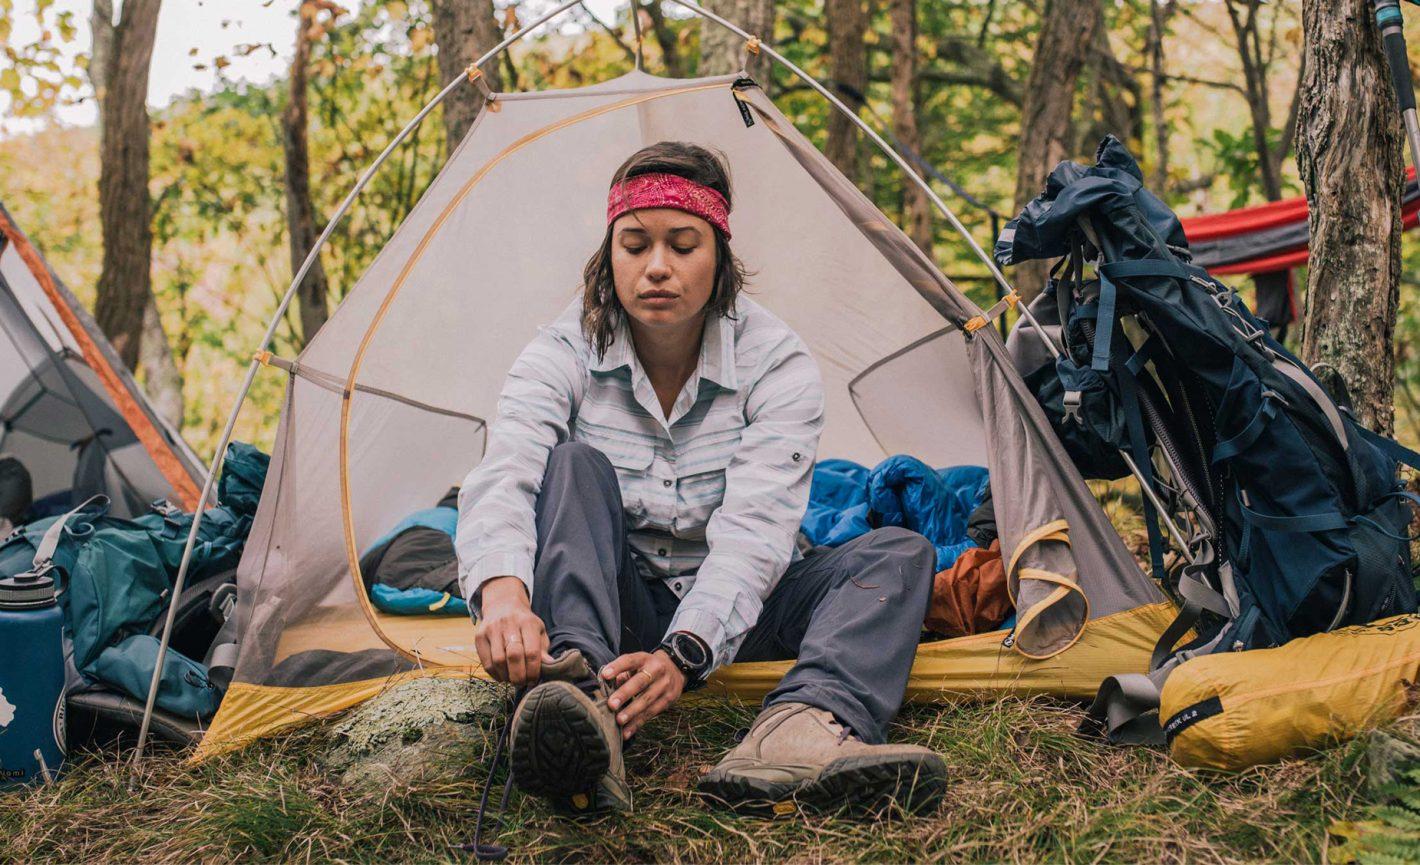 Sacramento REI Store to Host Free Women's Camping Basics Course